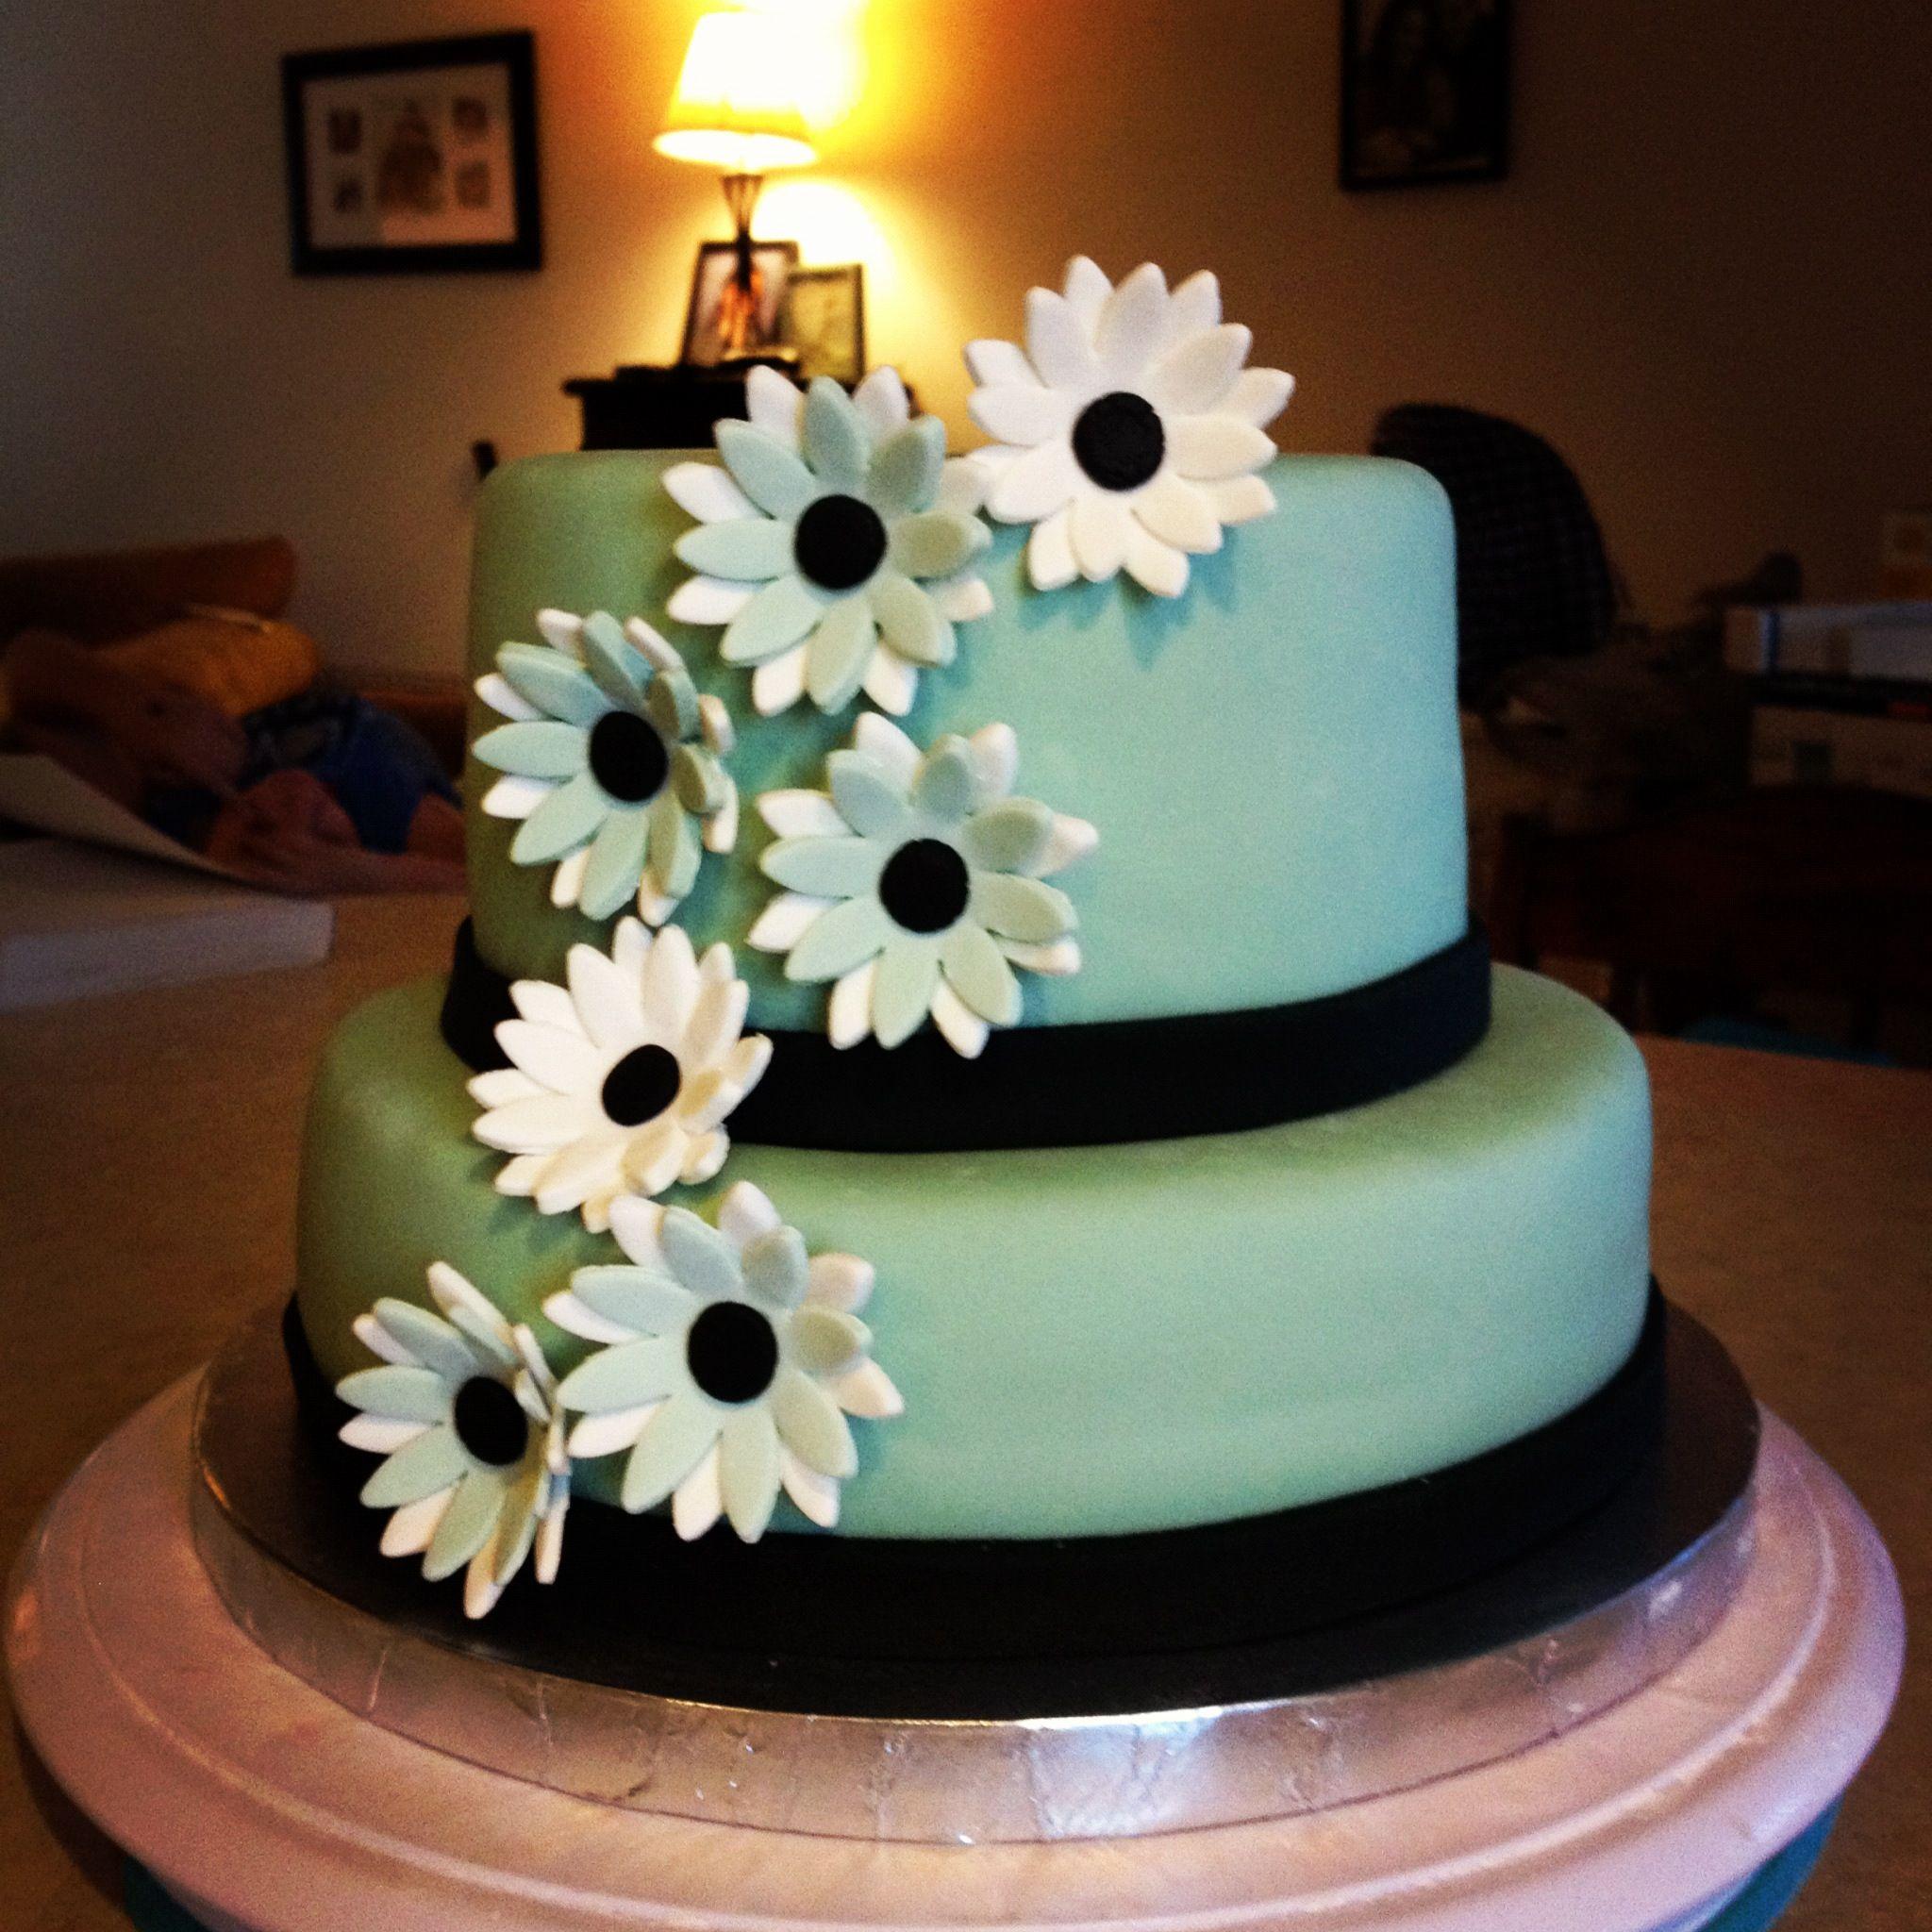 Birthday Cake Ideas Her : 30th birthday cake by me :) Cakes & Cupcakes - A Reason ...